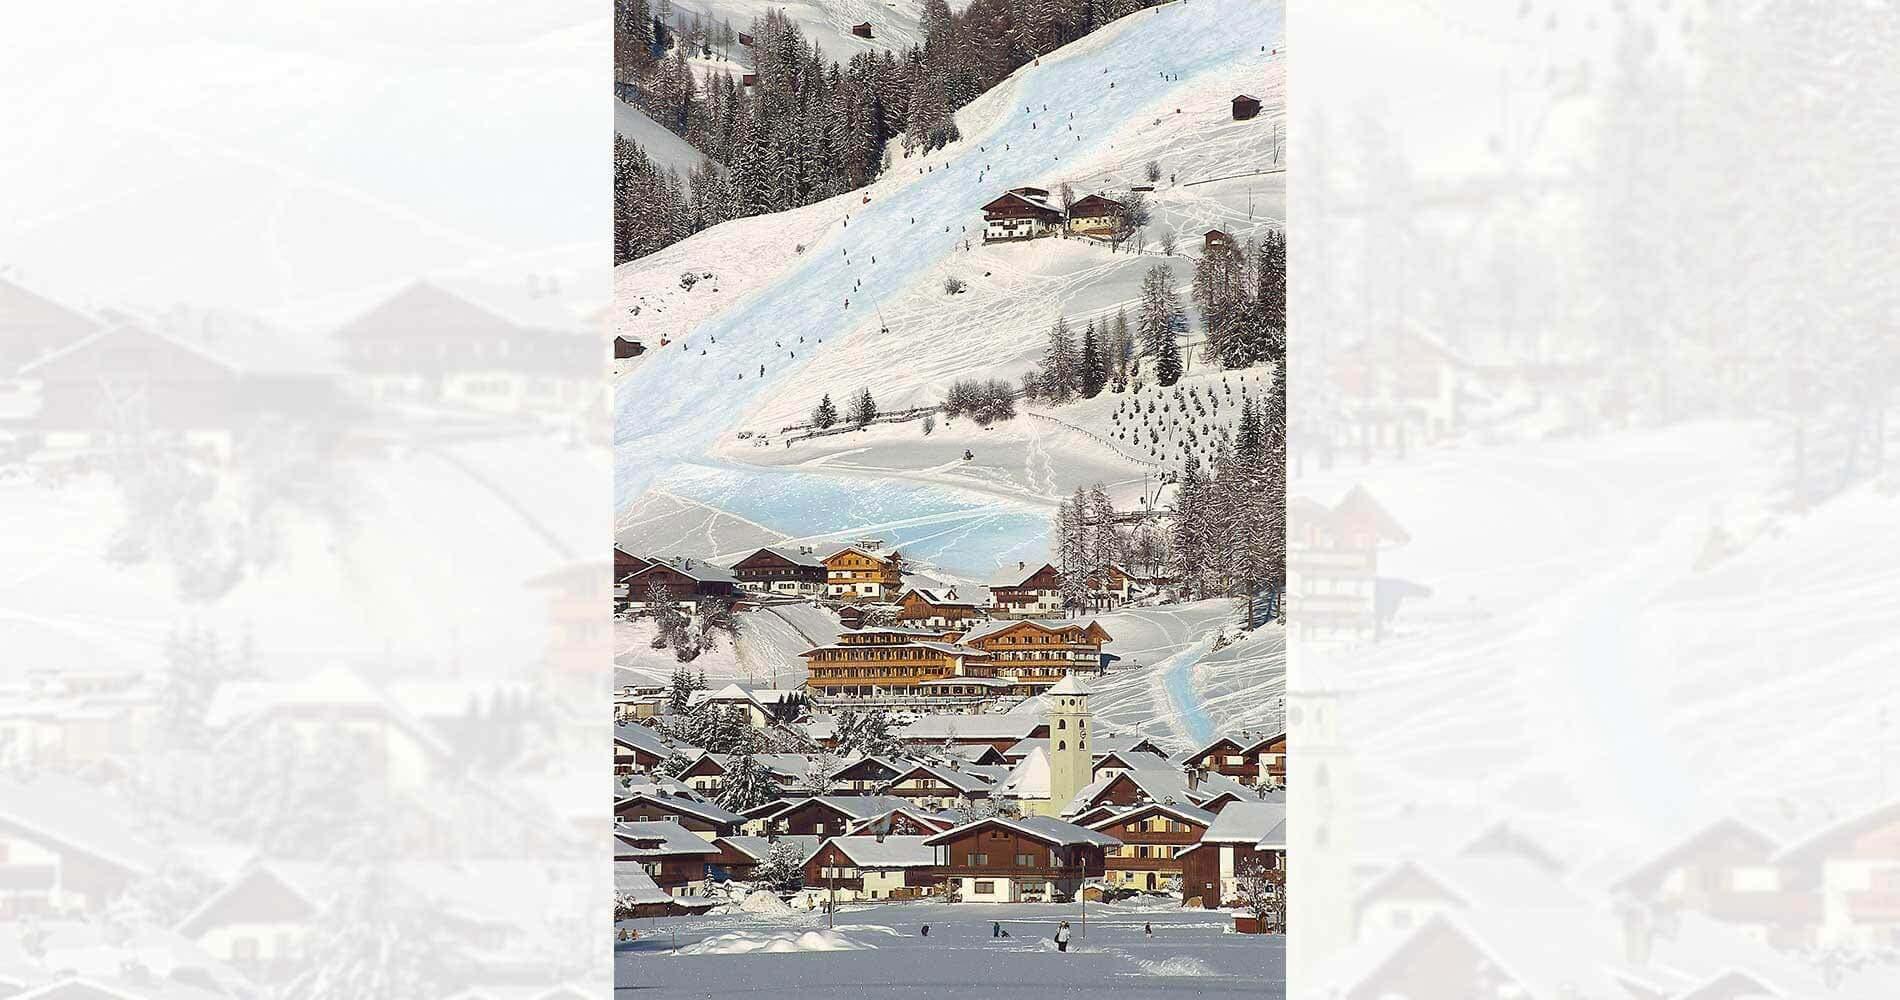 Berghotel in the Dolomites of Sesto - 4 star hotel in South Tyrol